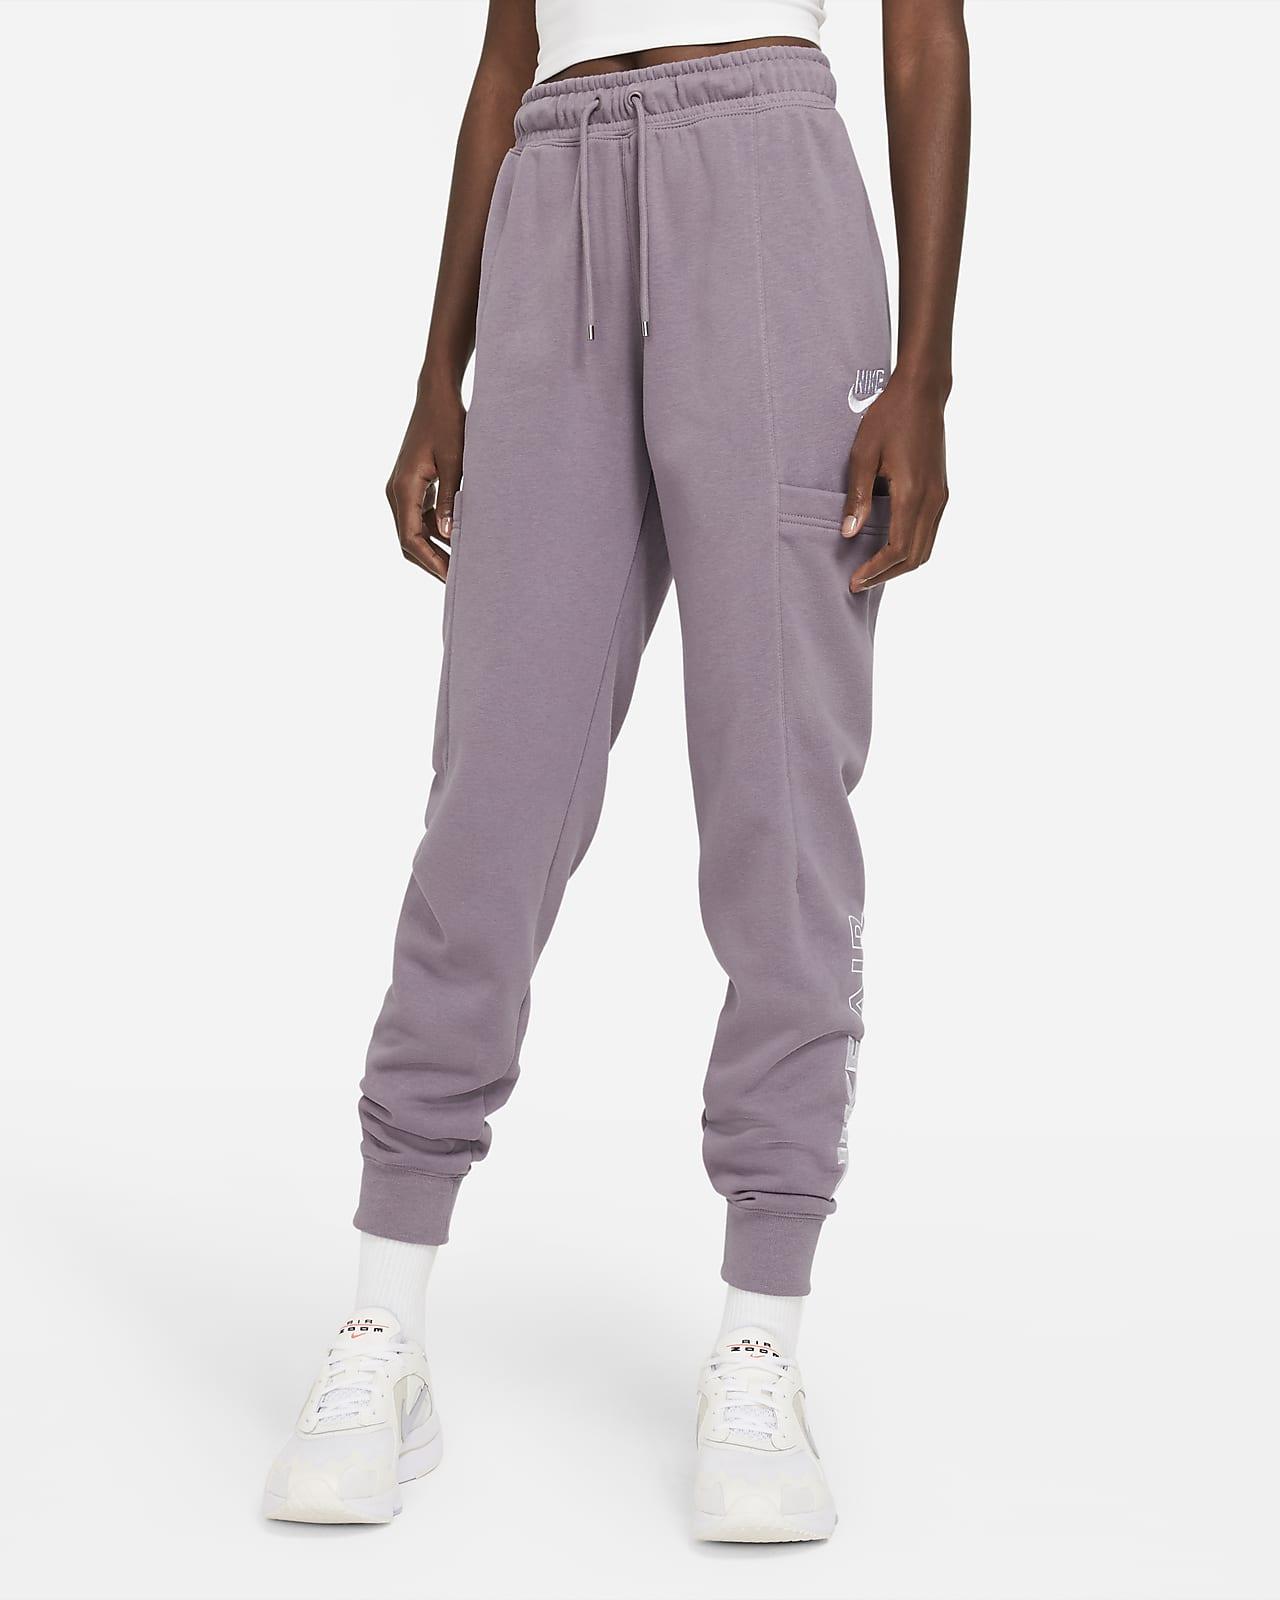 Pantalones de tejido Fleece para mujer Nike Air